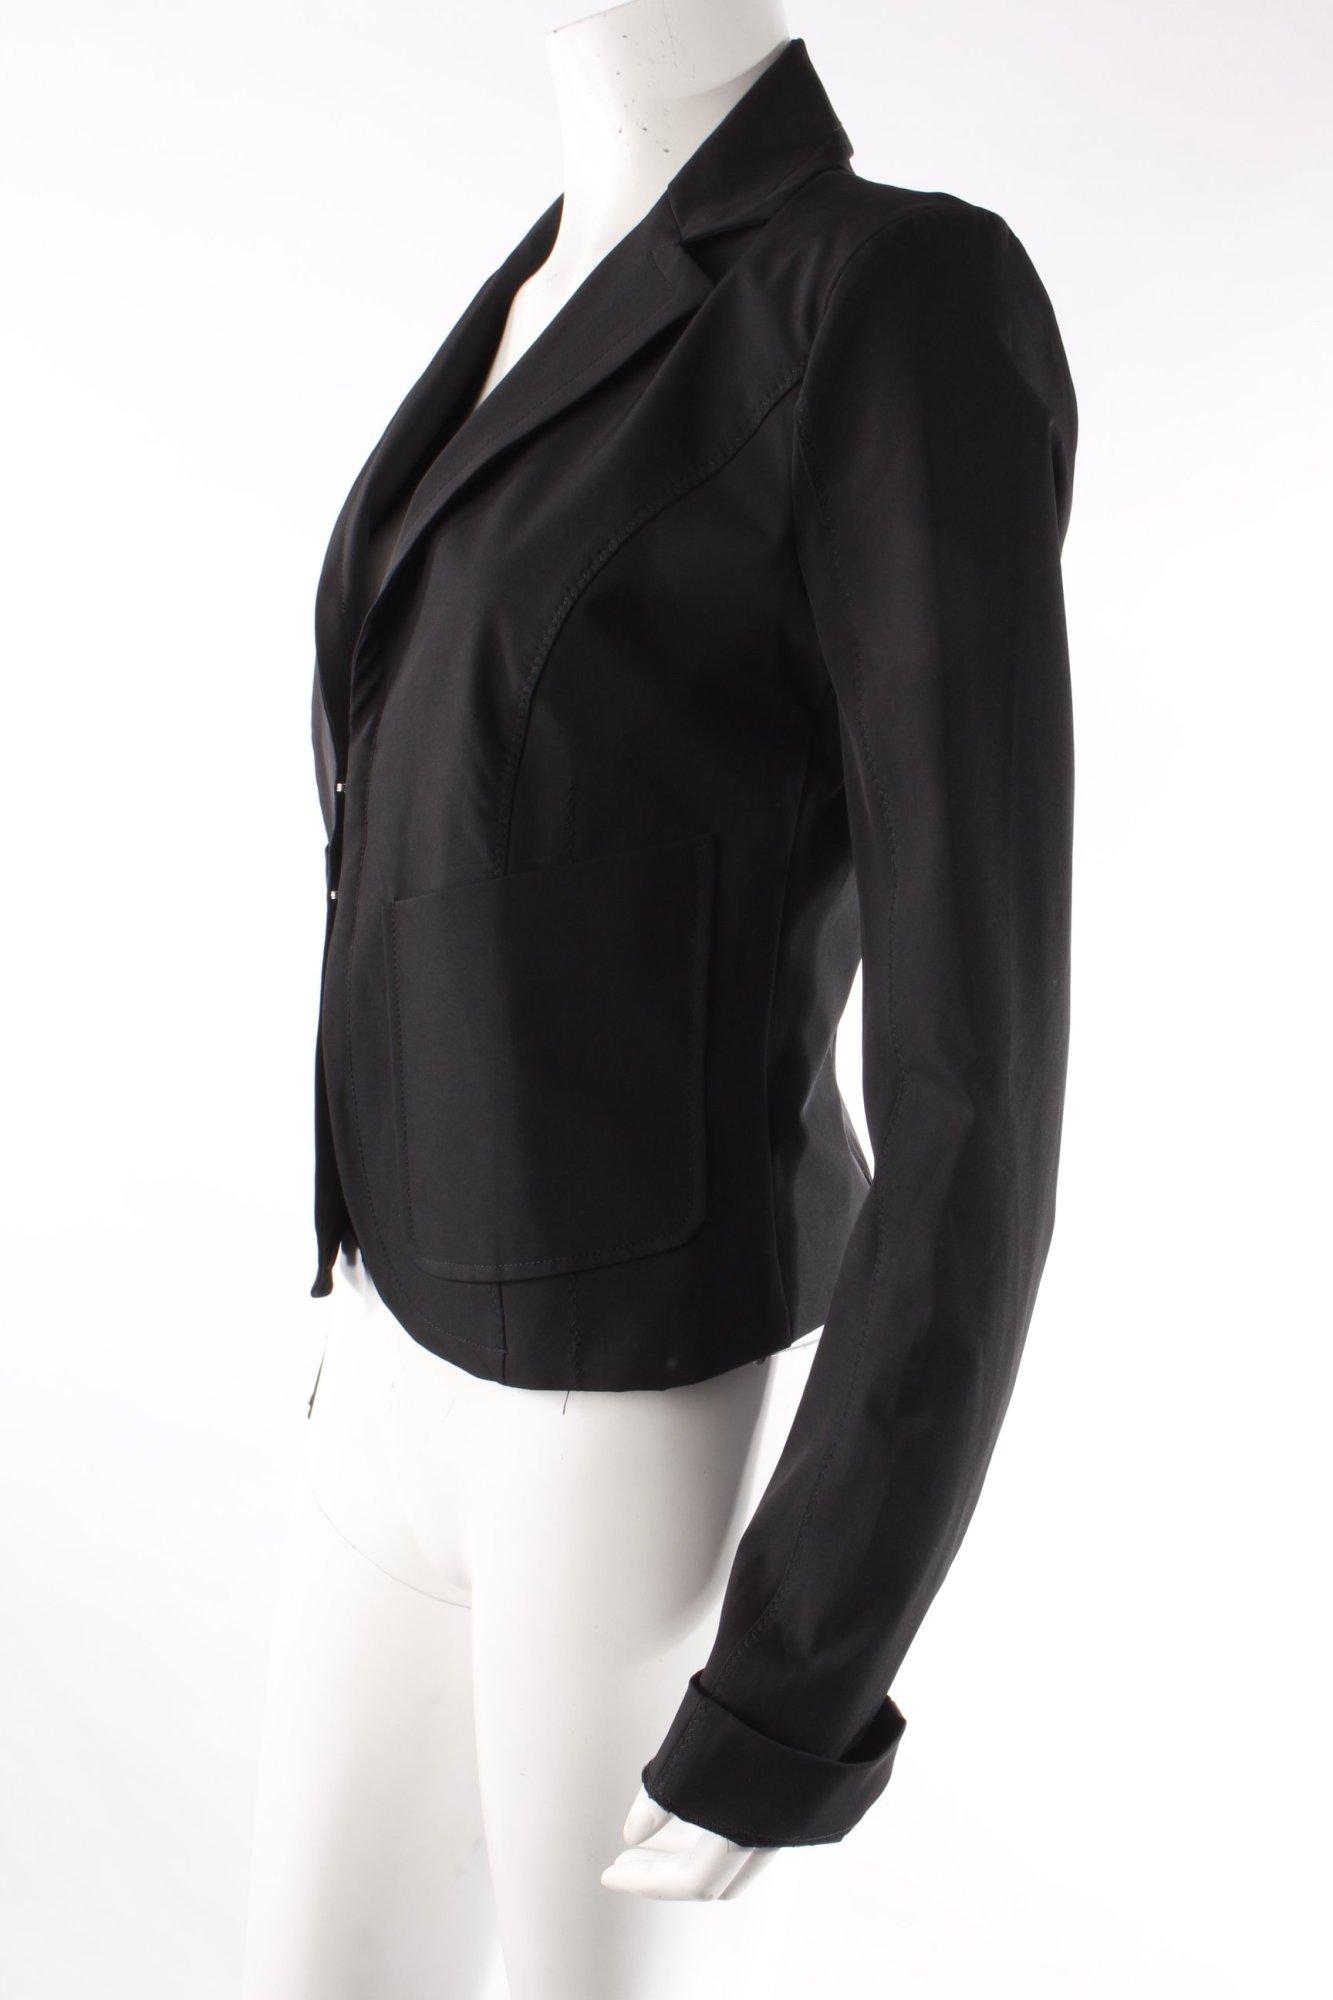 patrizia pepe blazer schwarz damen gr de 36 smoking blazer tuxedo blazer ebay. Black Bedroom Furniture Sets. Home Design Ideas